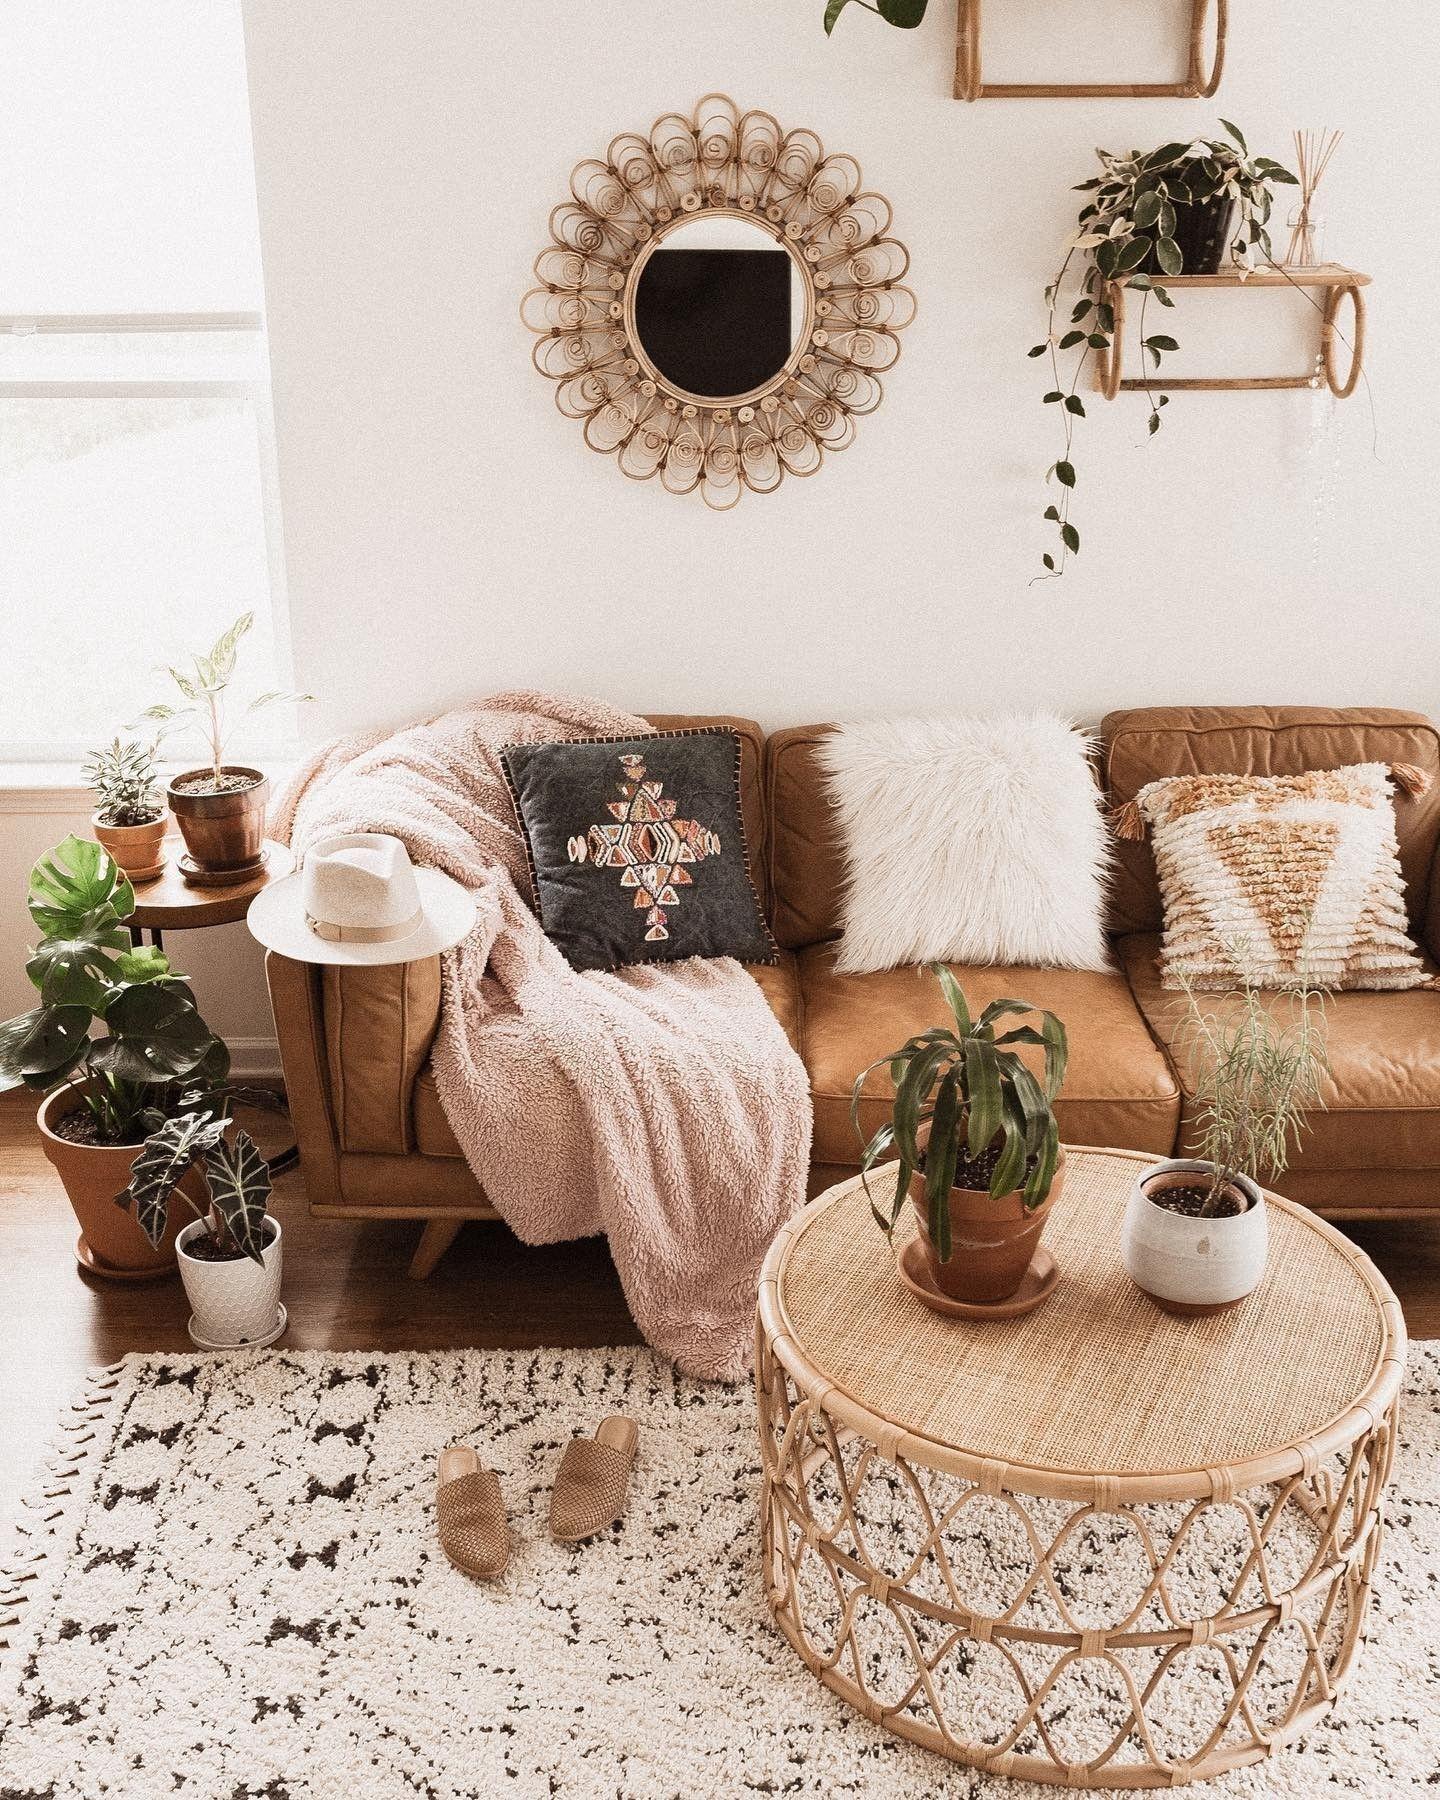 Timber Charme Tan Sofa Urban Outfitters Home Boho Living Room Home Decor